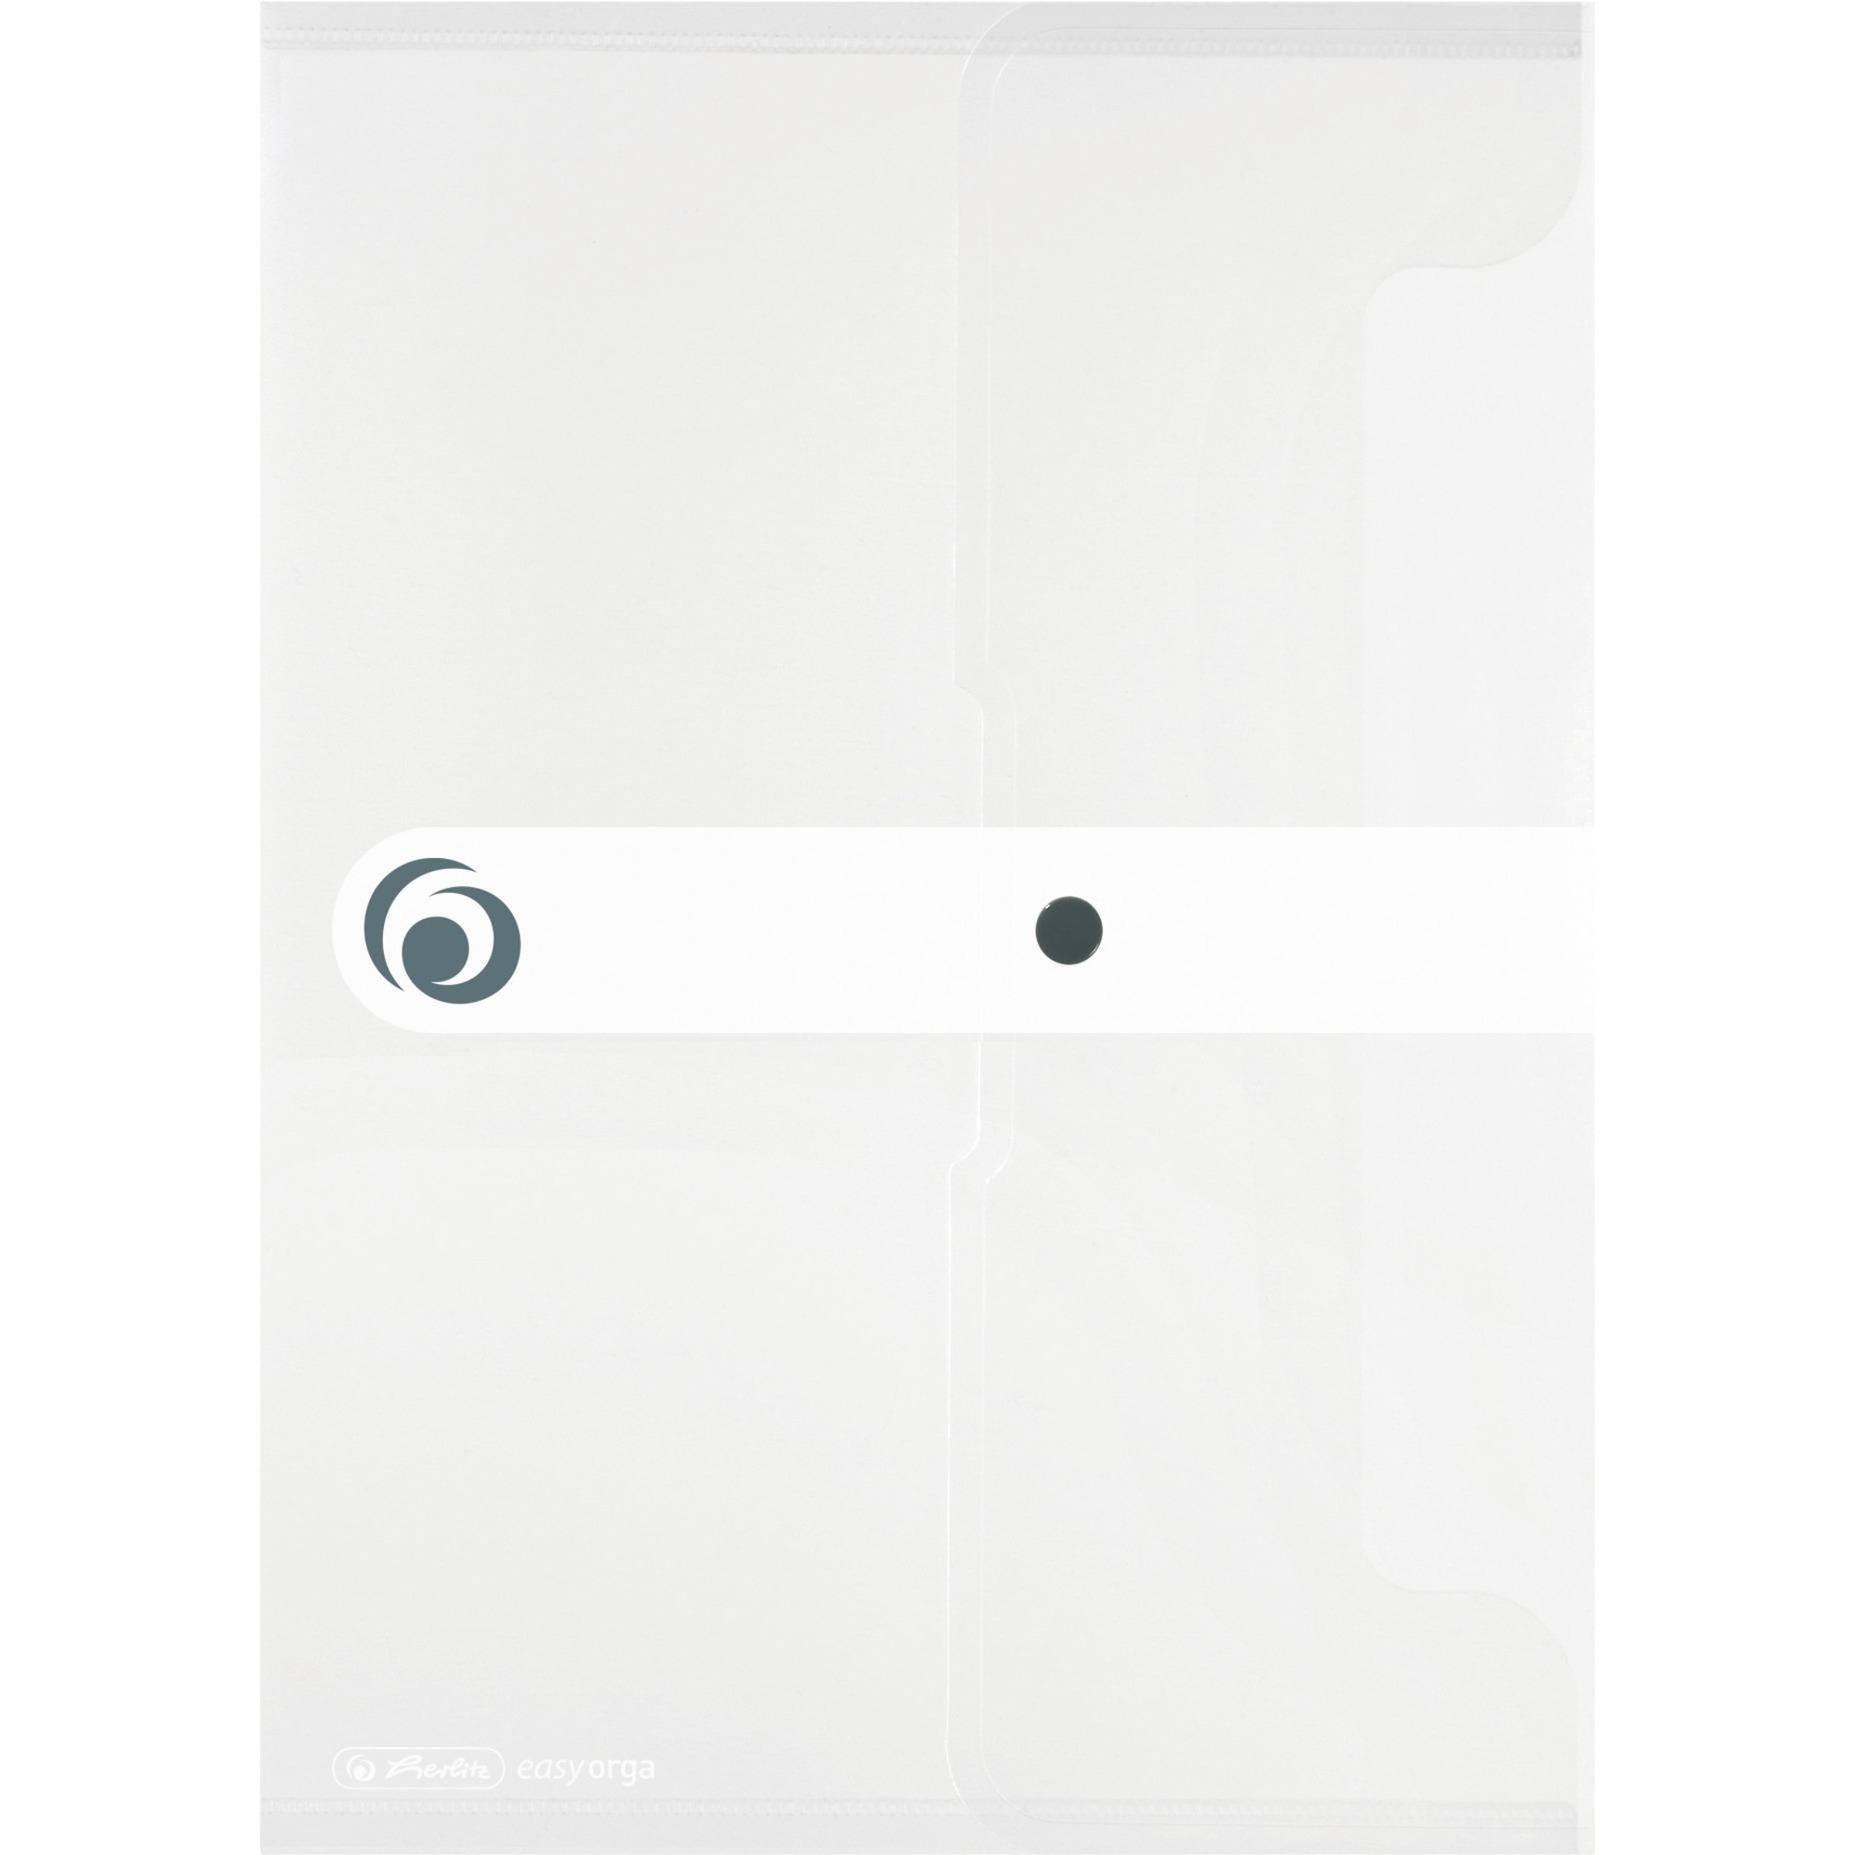 11206653 carpeta Polipropileno (PP) Transparente, Bolsa